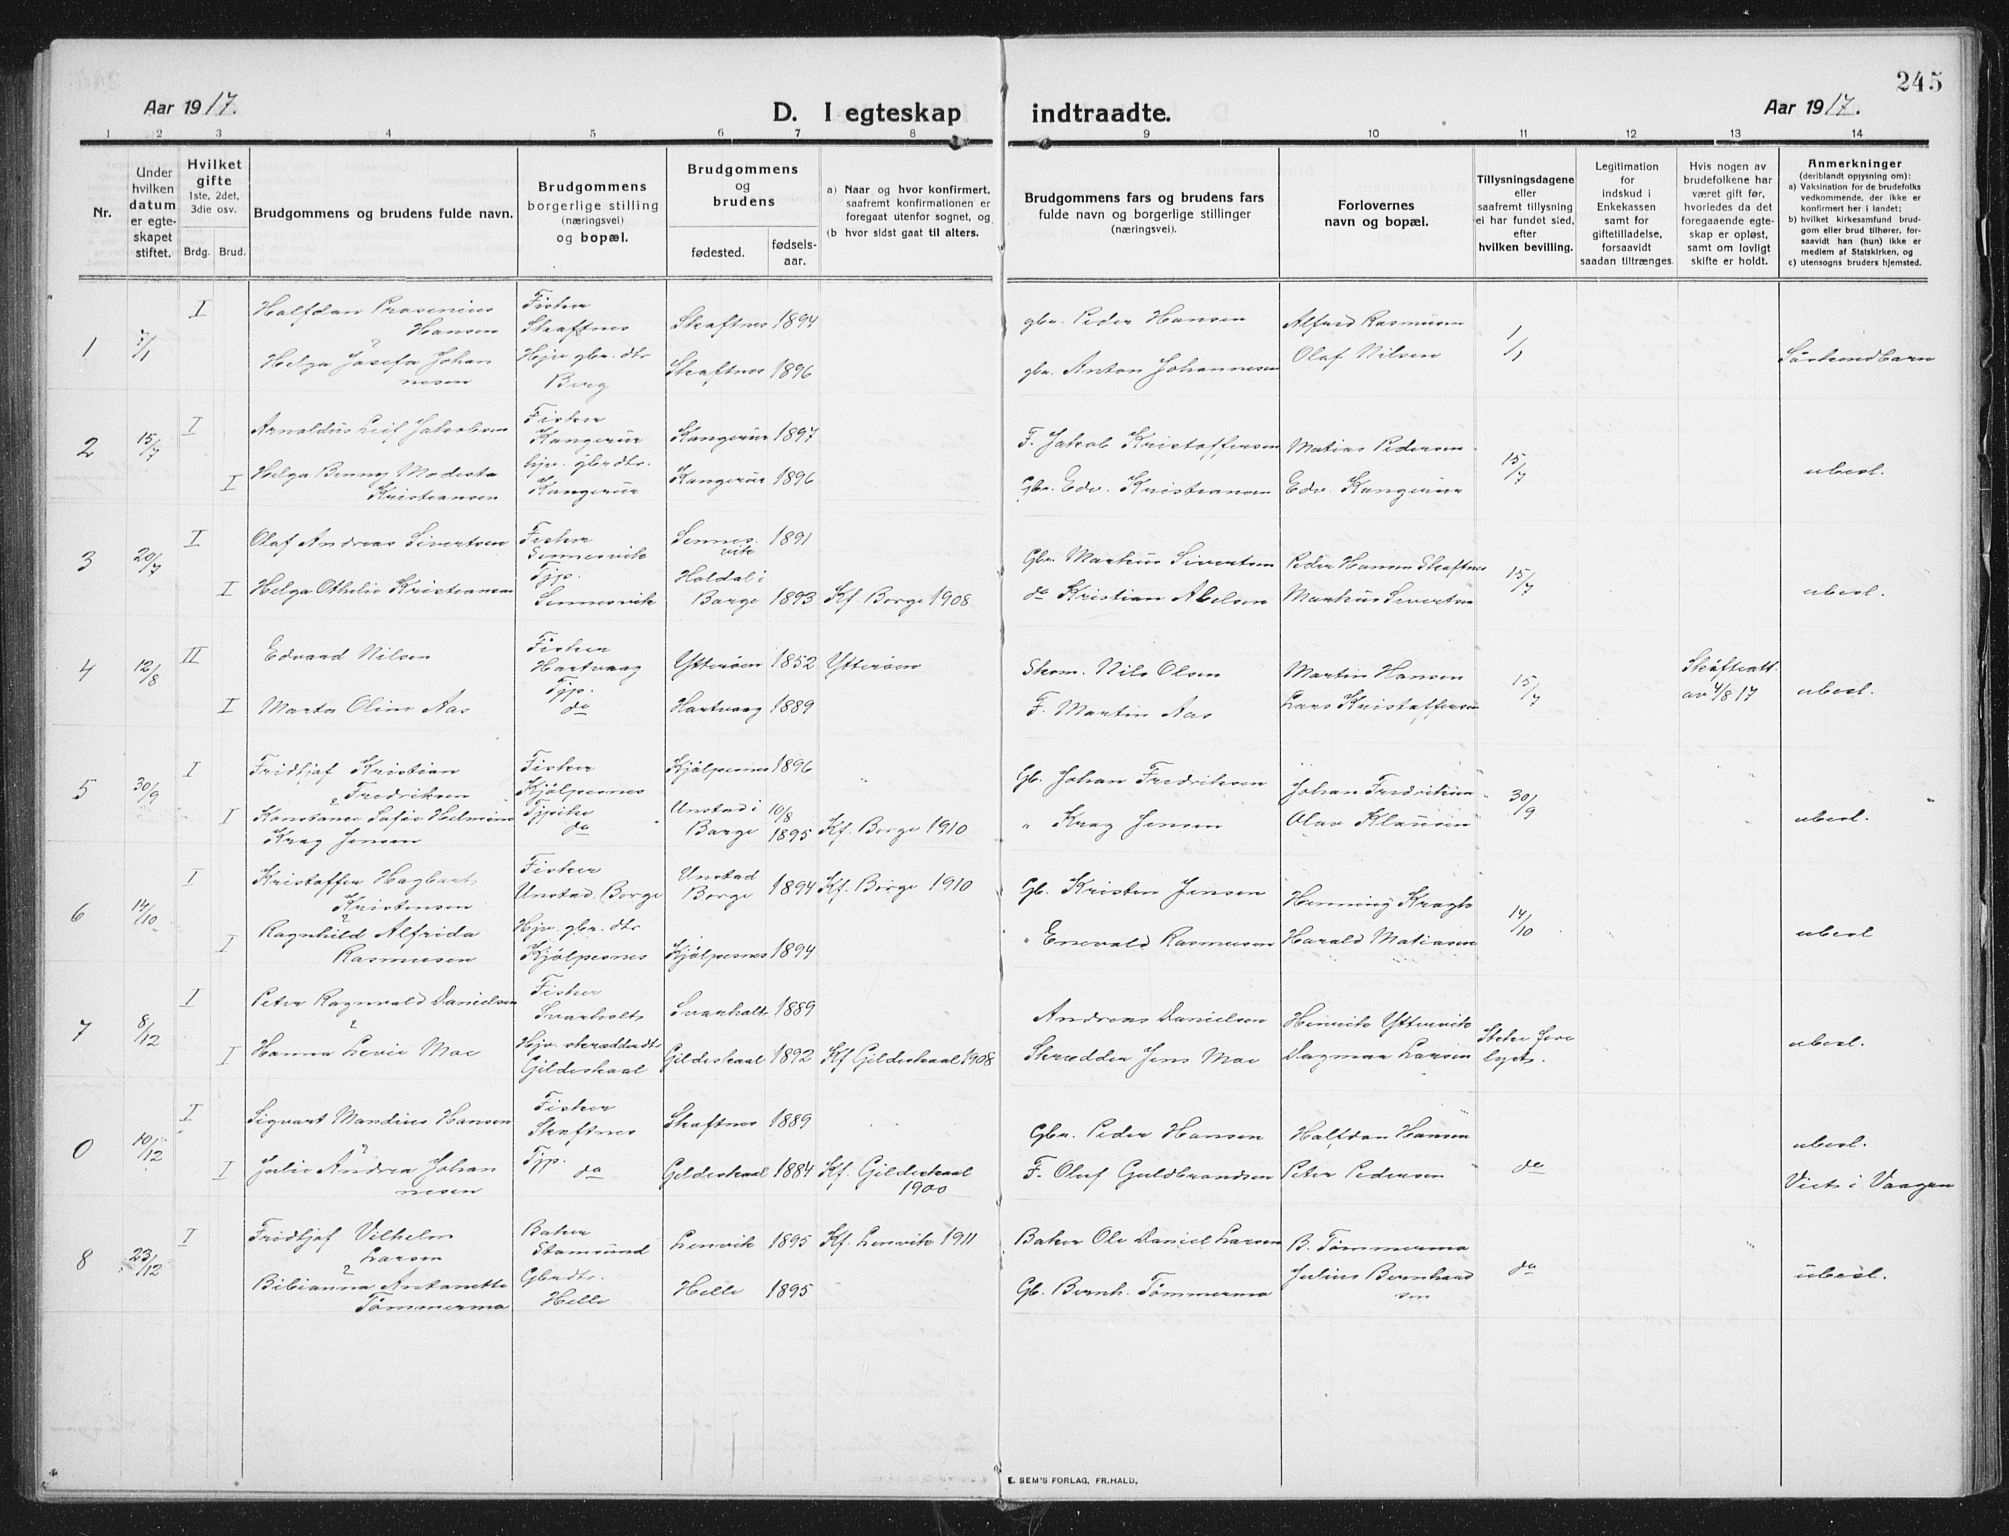 SAT, Ministerialprotokoller, klokkerbøker og fødselsregistre - Nordland, 882/L1183: Klokkerbok nr. 882C01, 1911-1938, s. 245